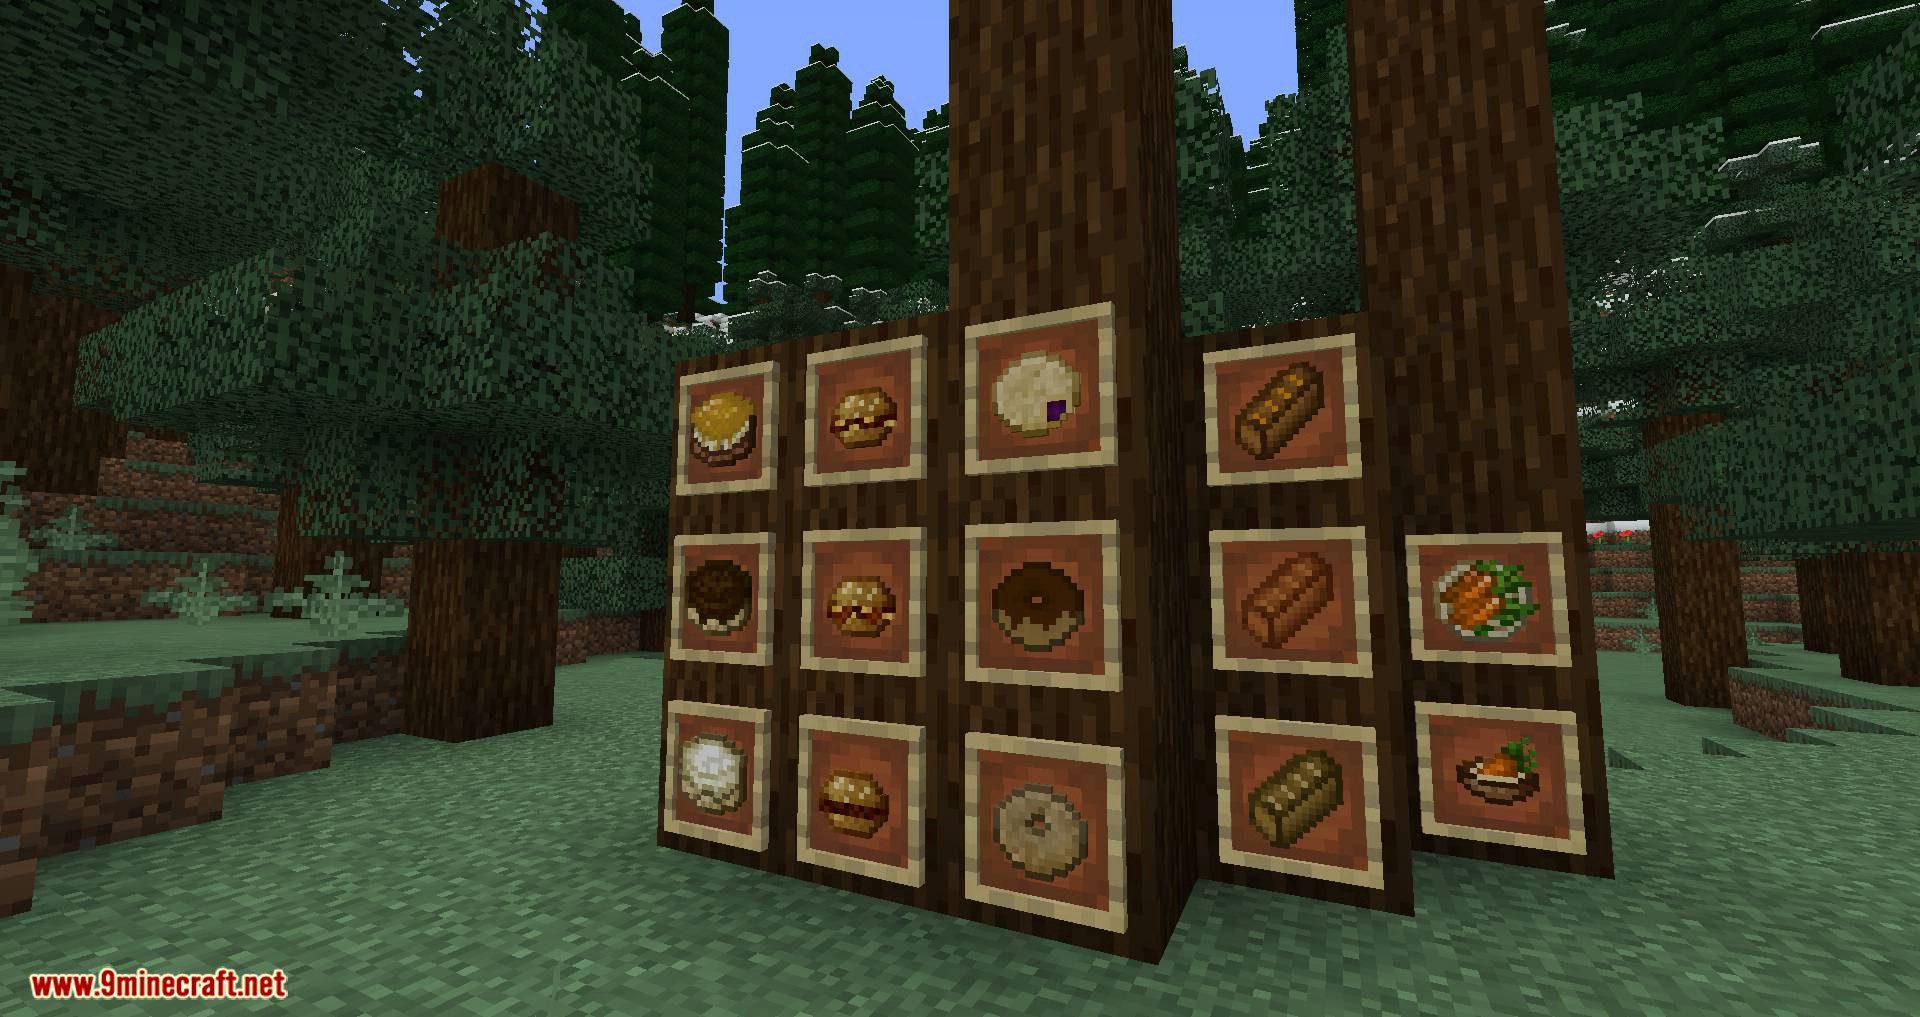 Pam_s HarvestCraft 2 Food Core mod for minecraft 10